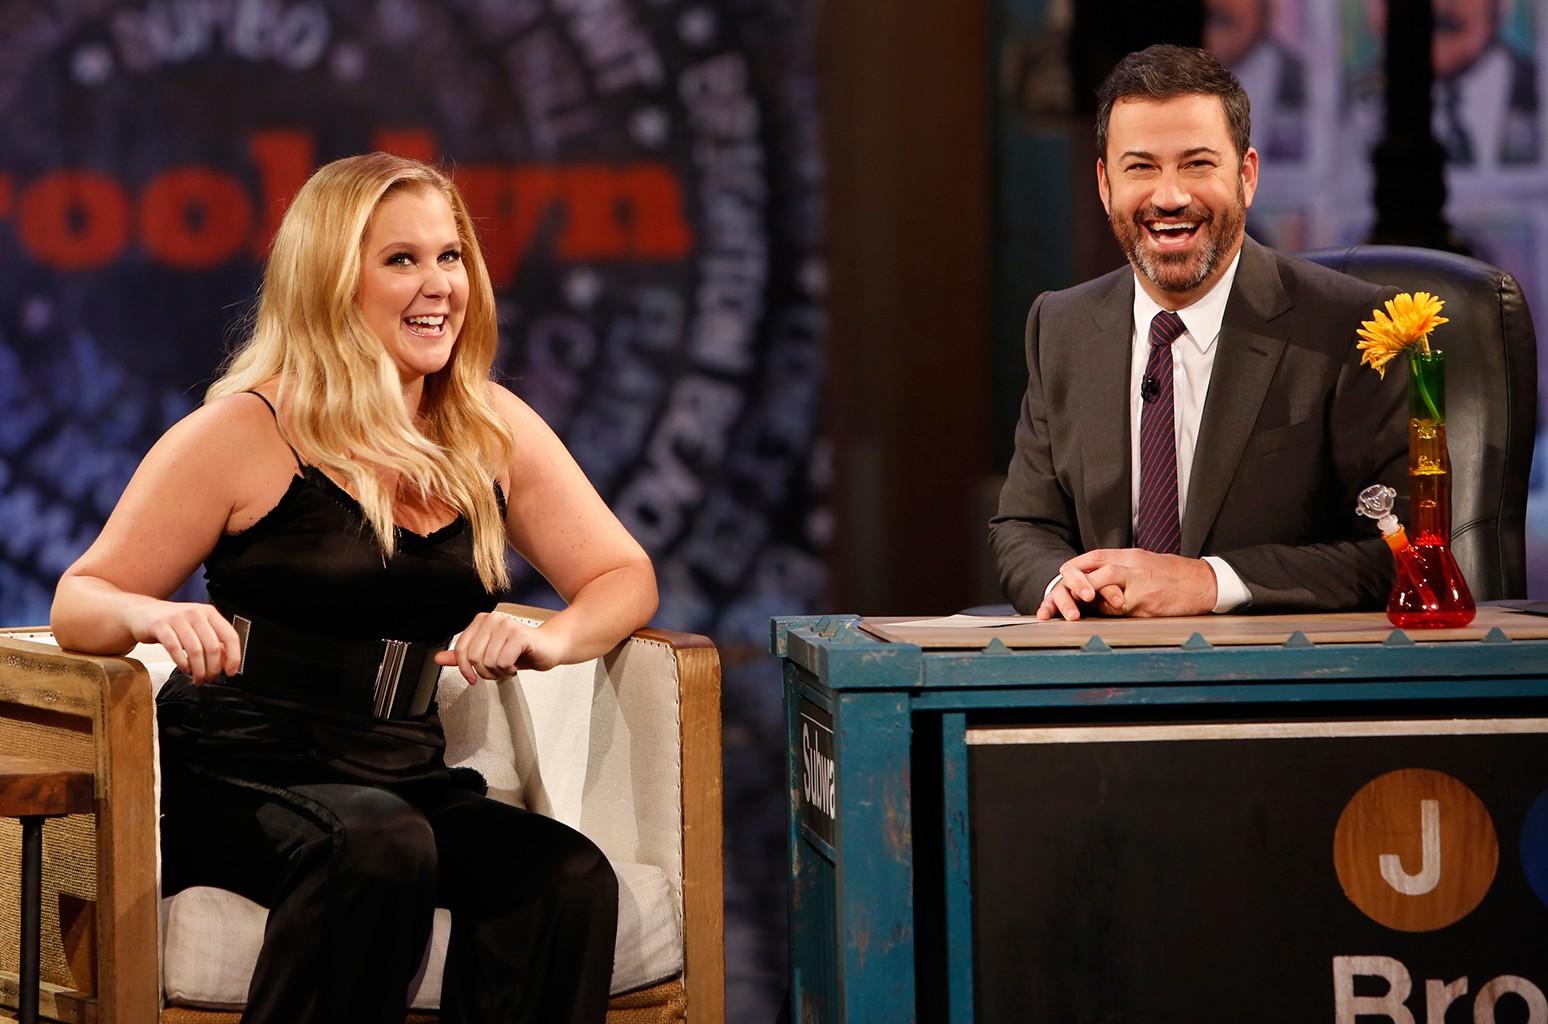 Amy Schumer & Jimmy Kimmel